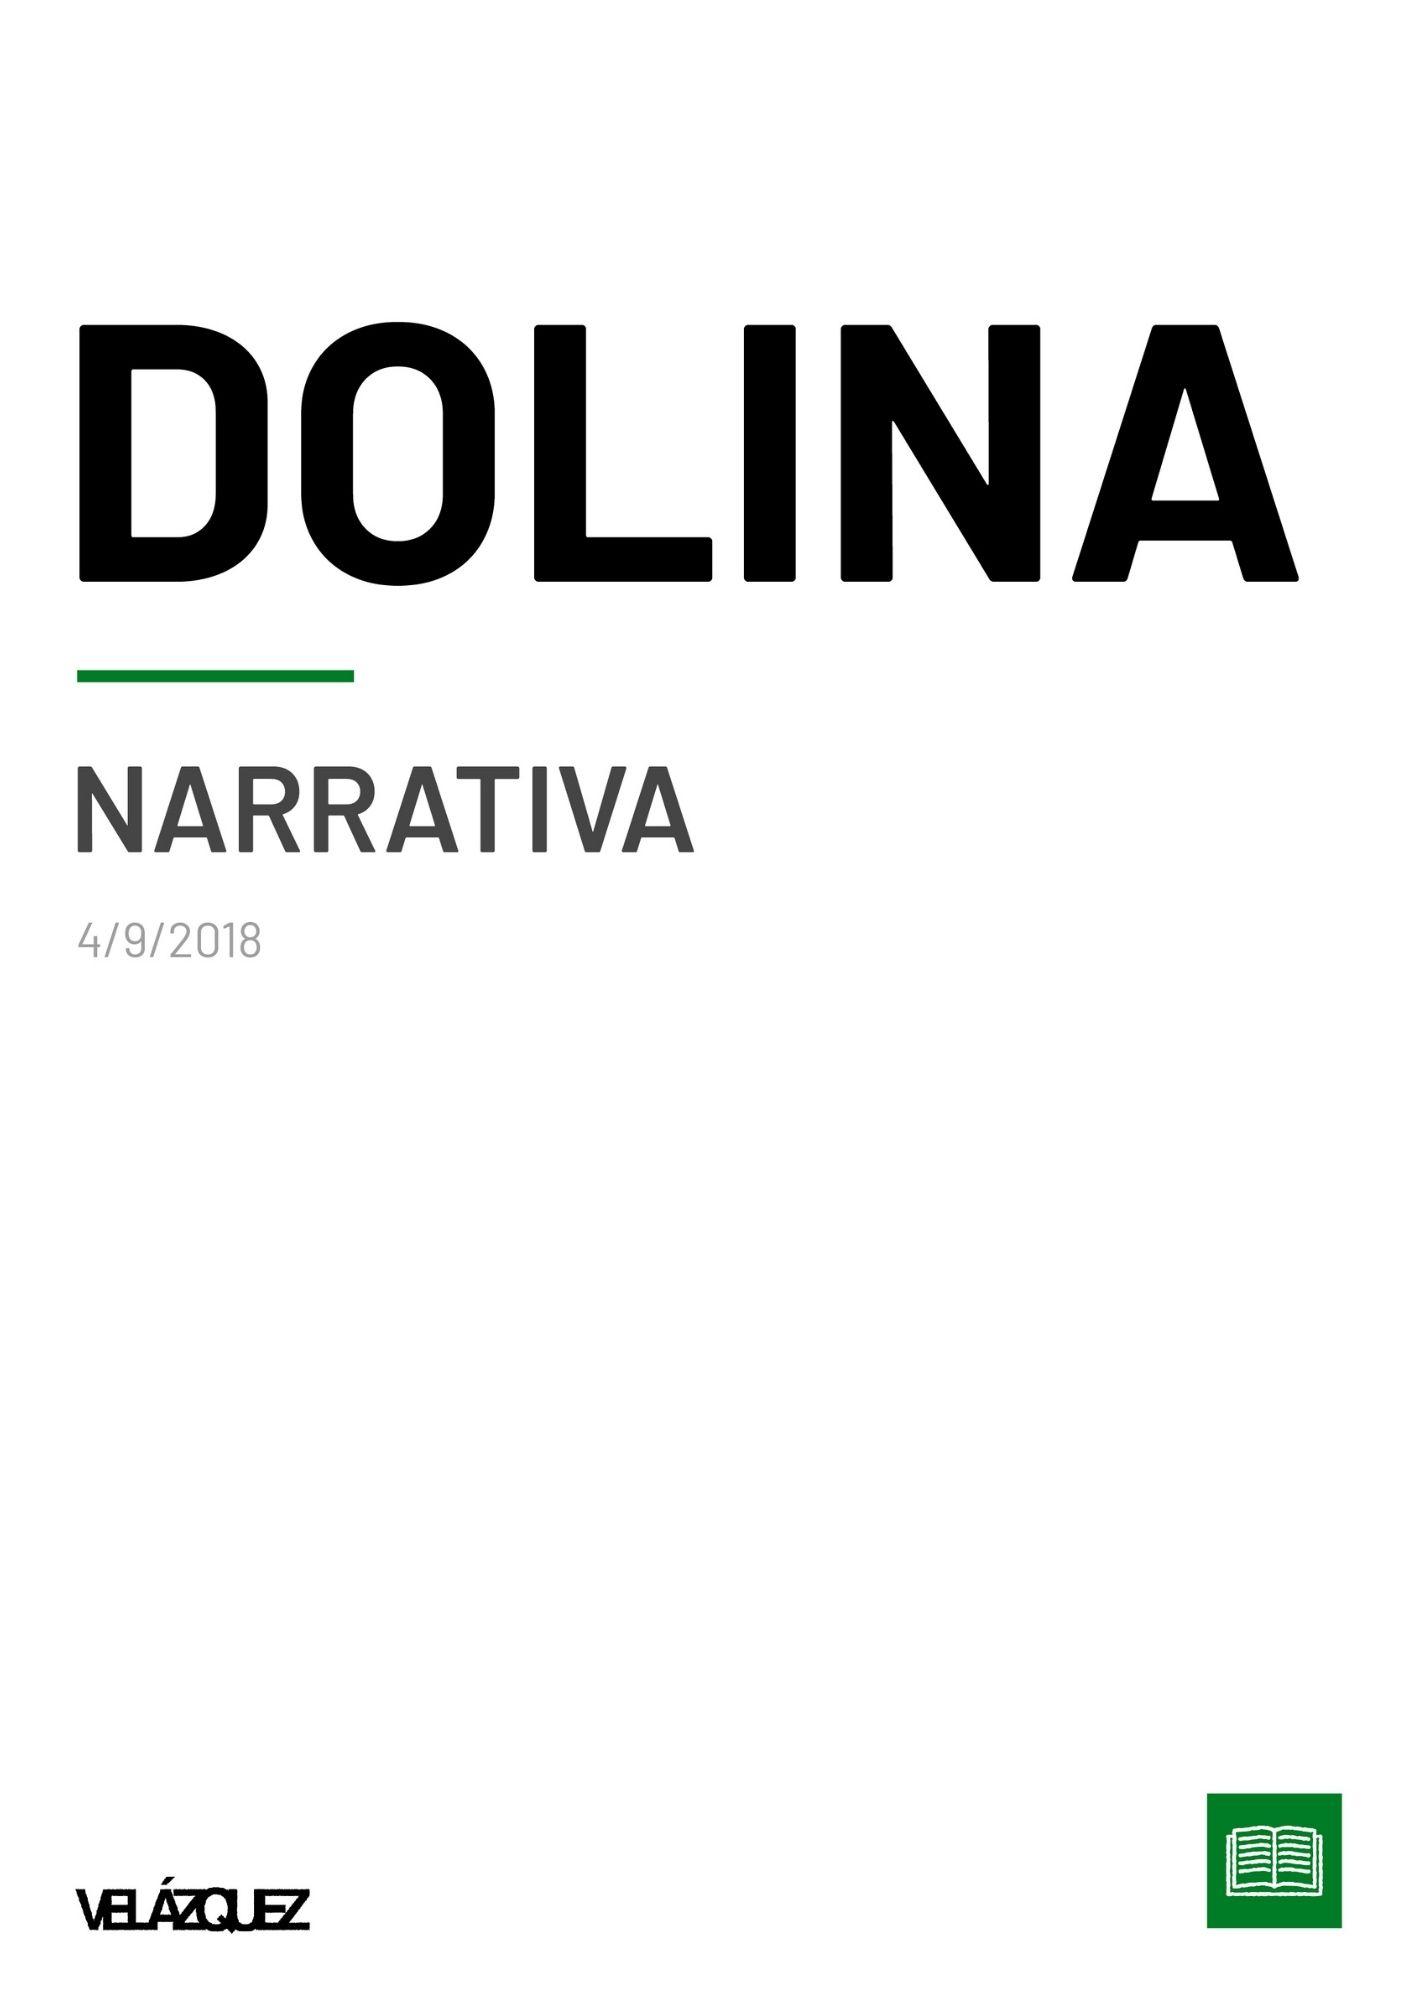 Dolina - Narrativa - Fabri Velázquez